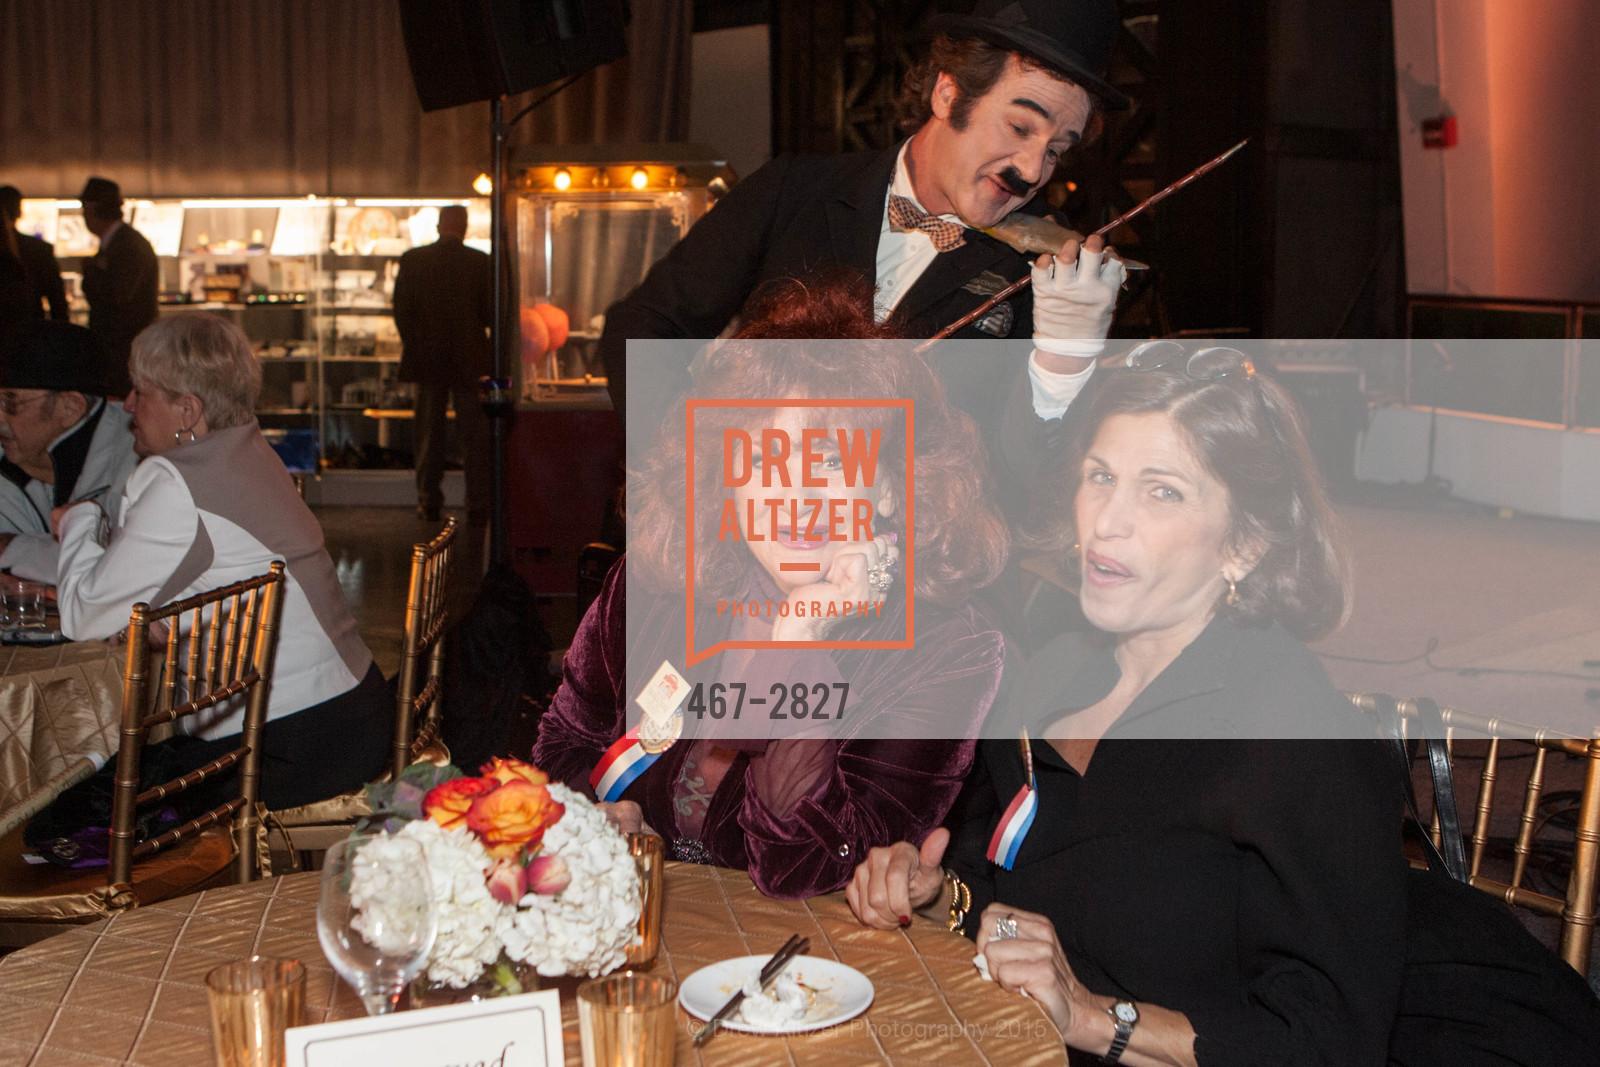 Pat Brown, Doris Raymond, Photo #467-2827